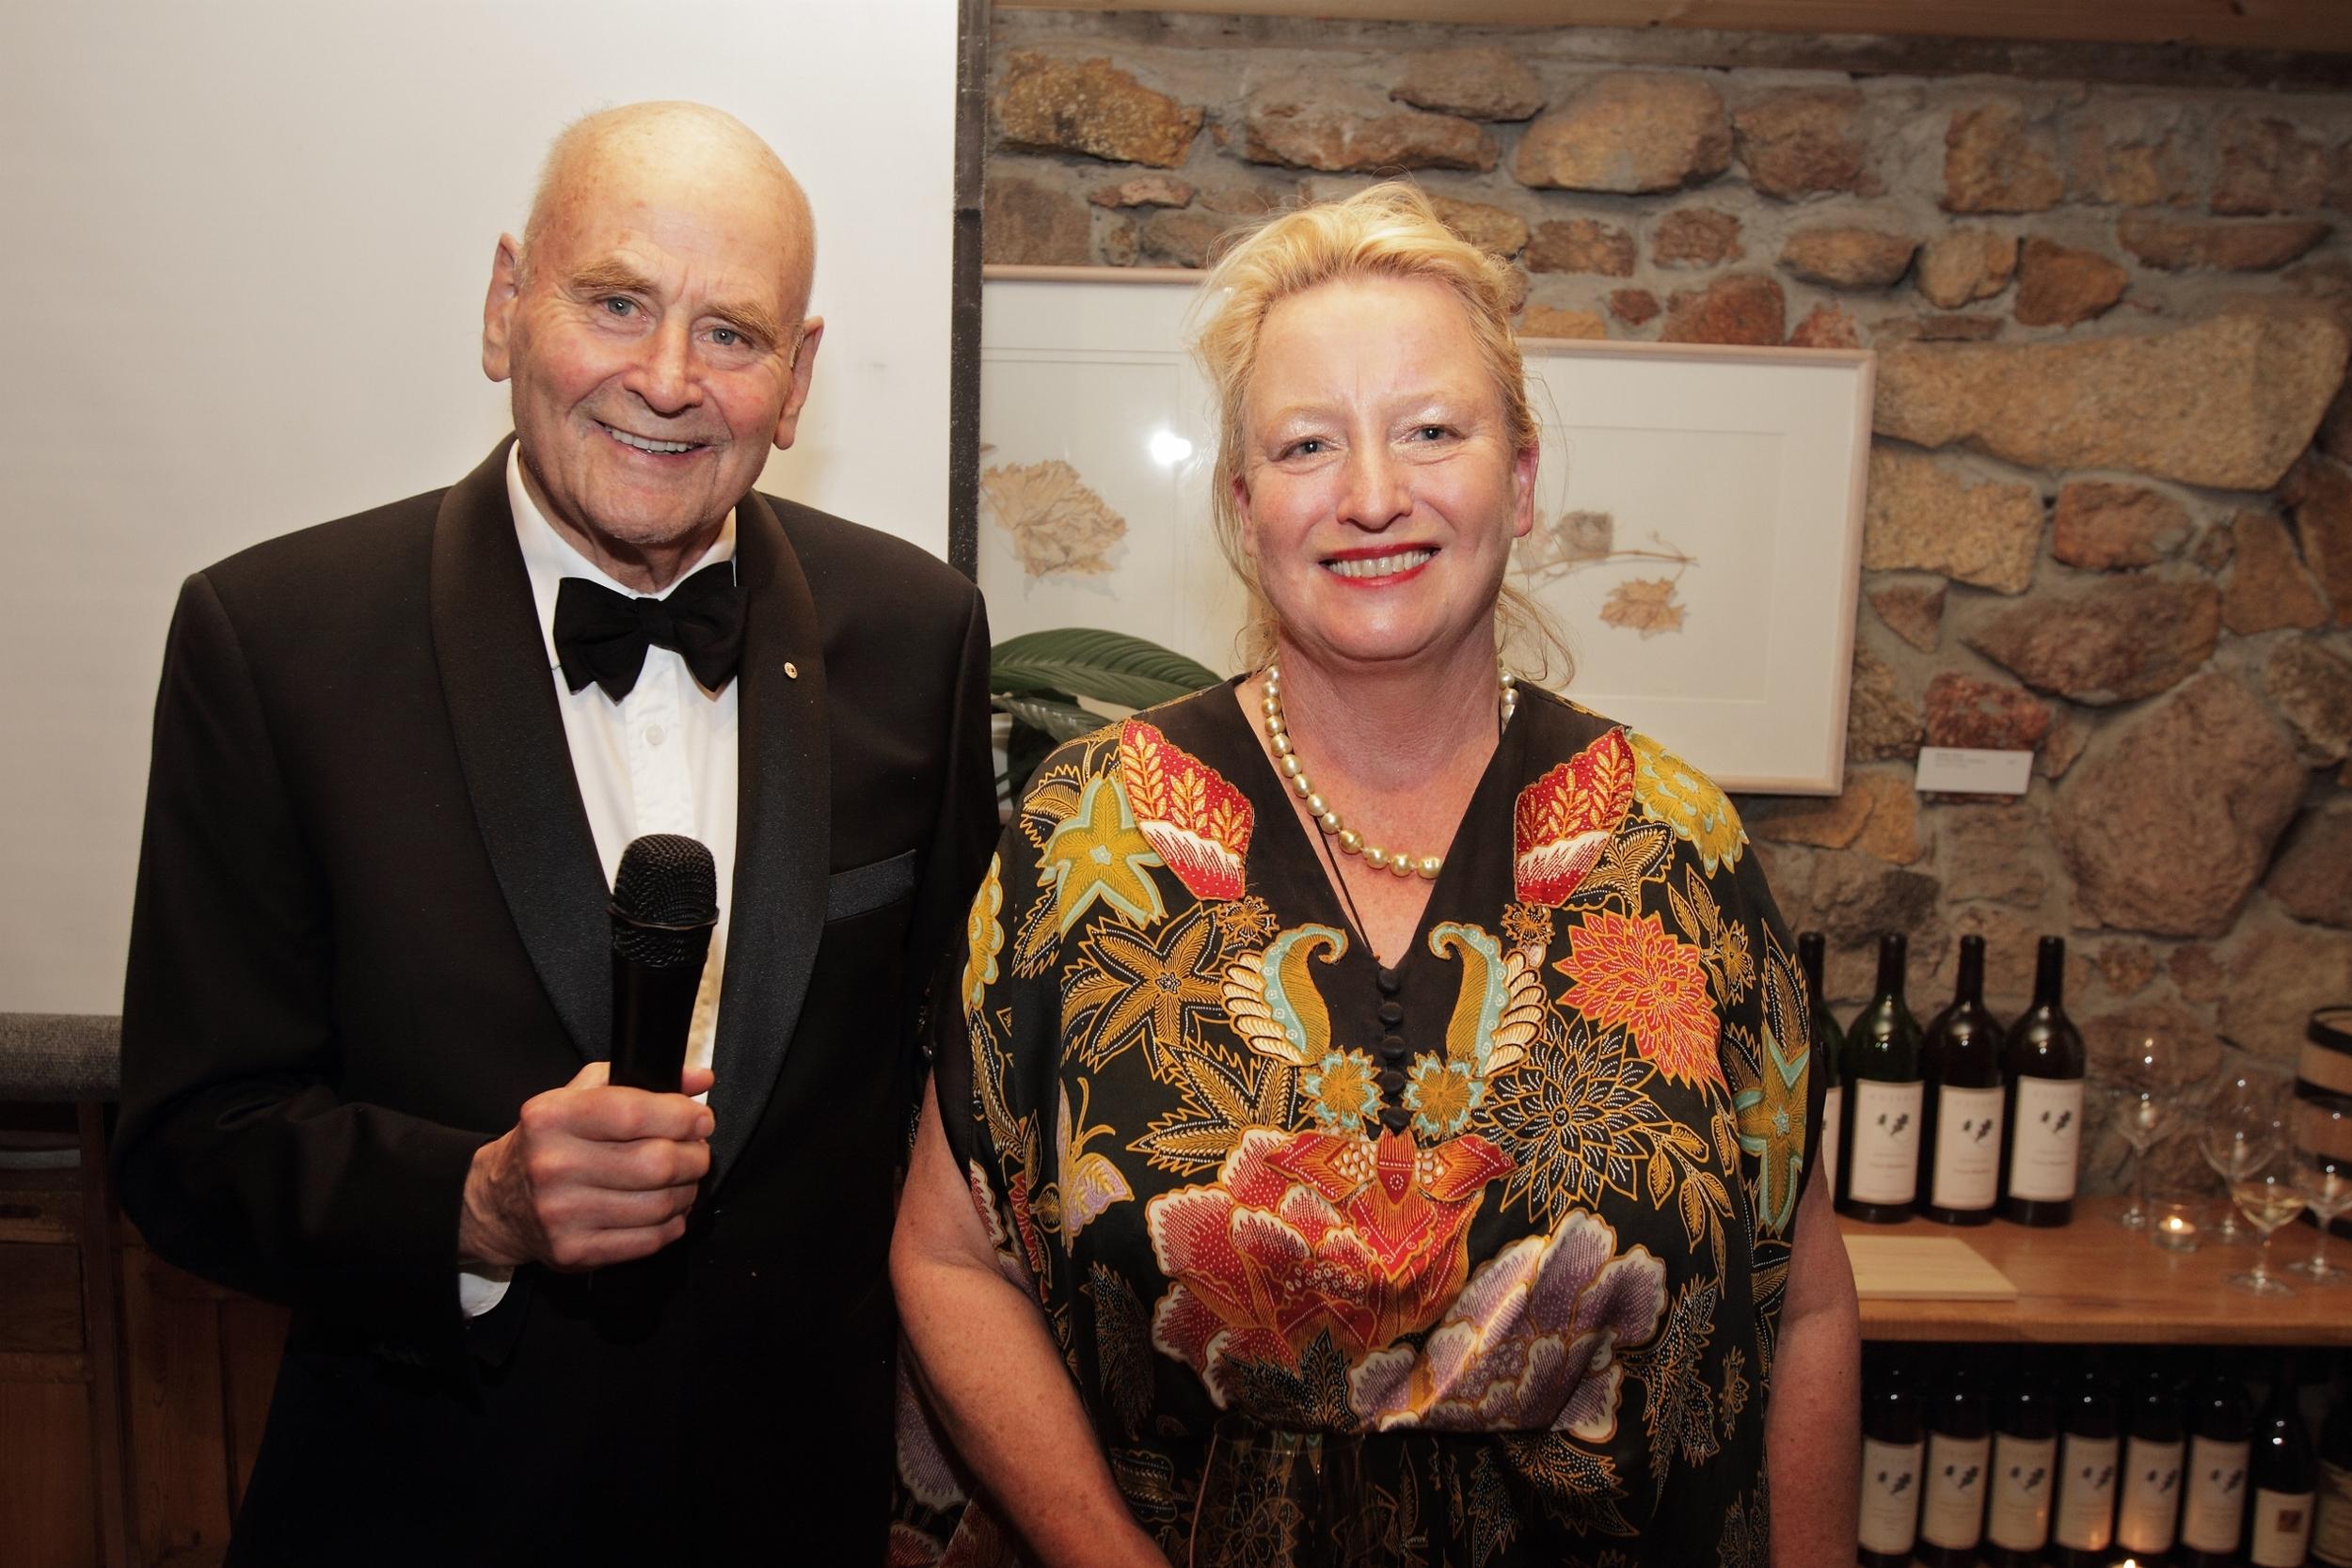 James Halliday and Vanya Cullen